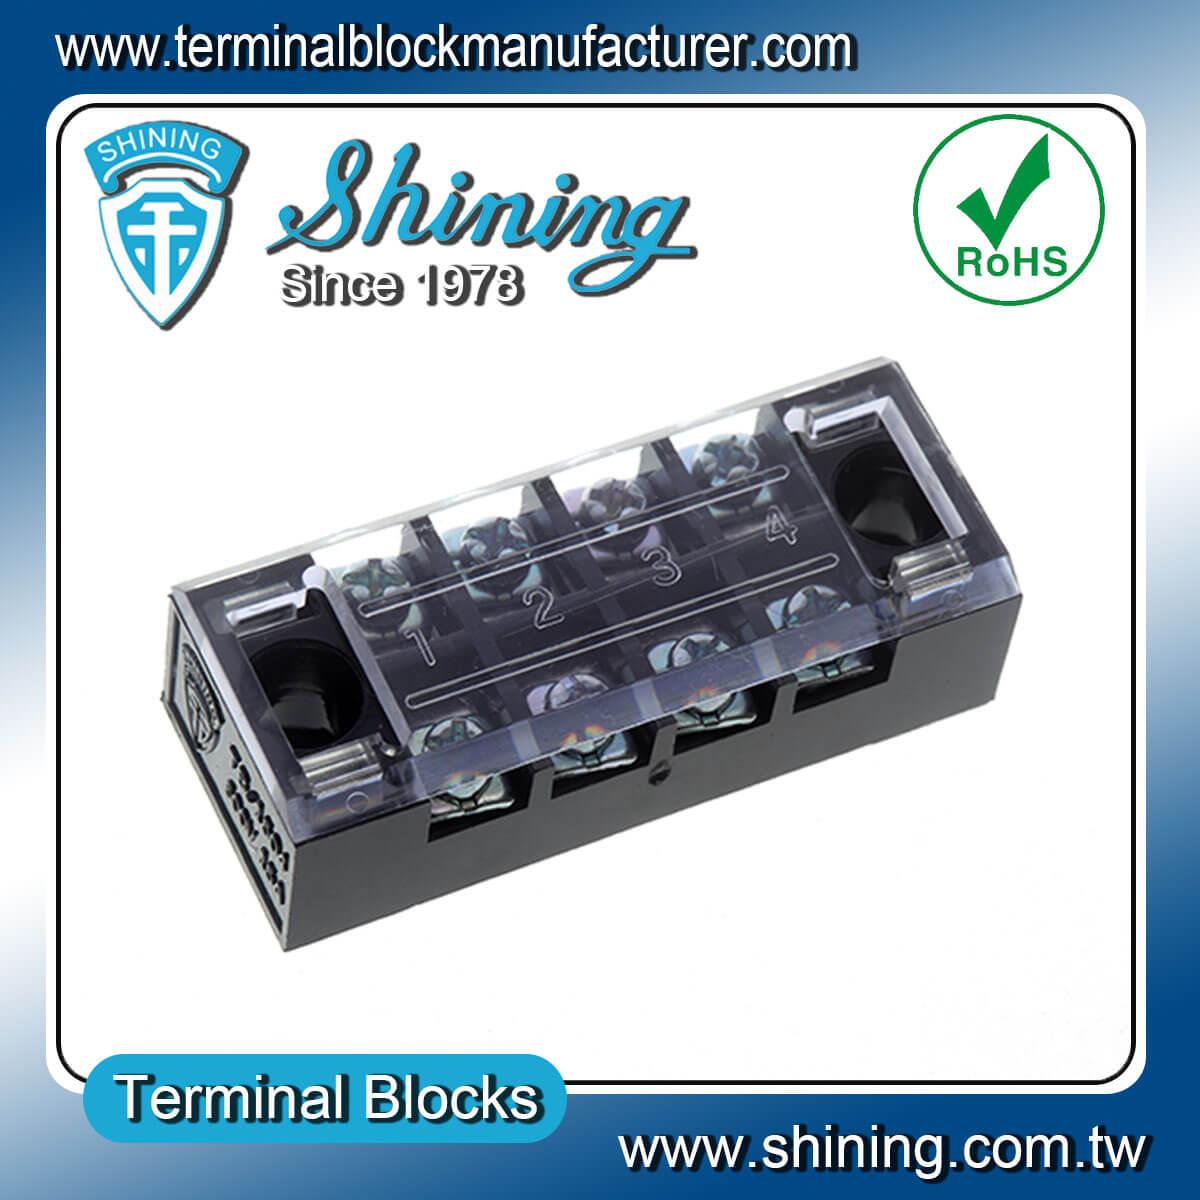 TB-2504 600V 15A 4Pole固定式柵欄端子台